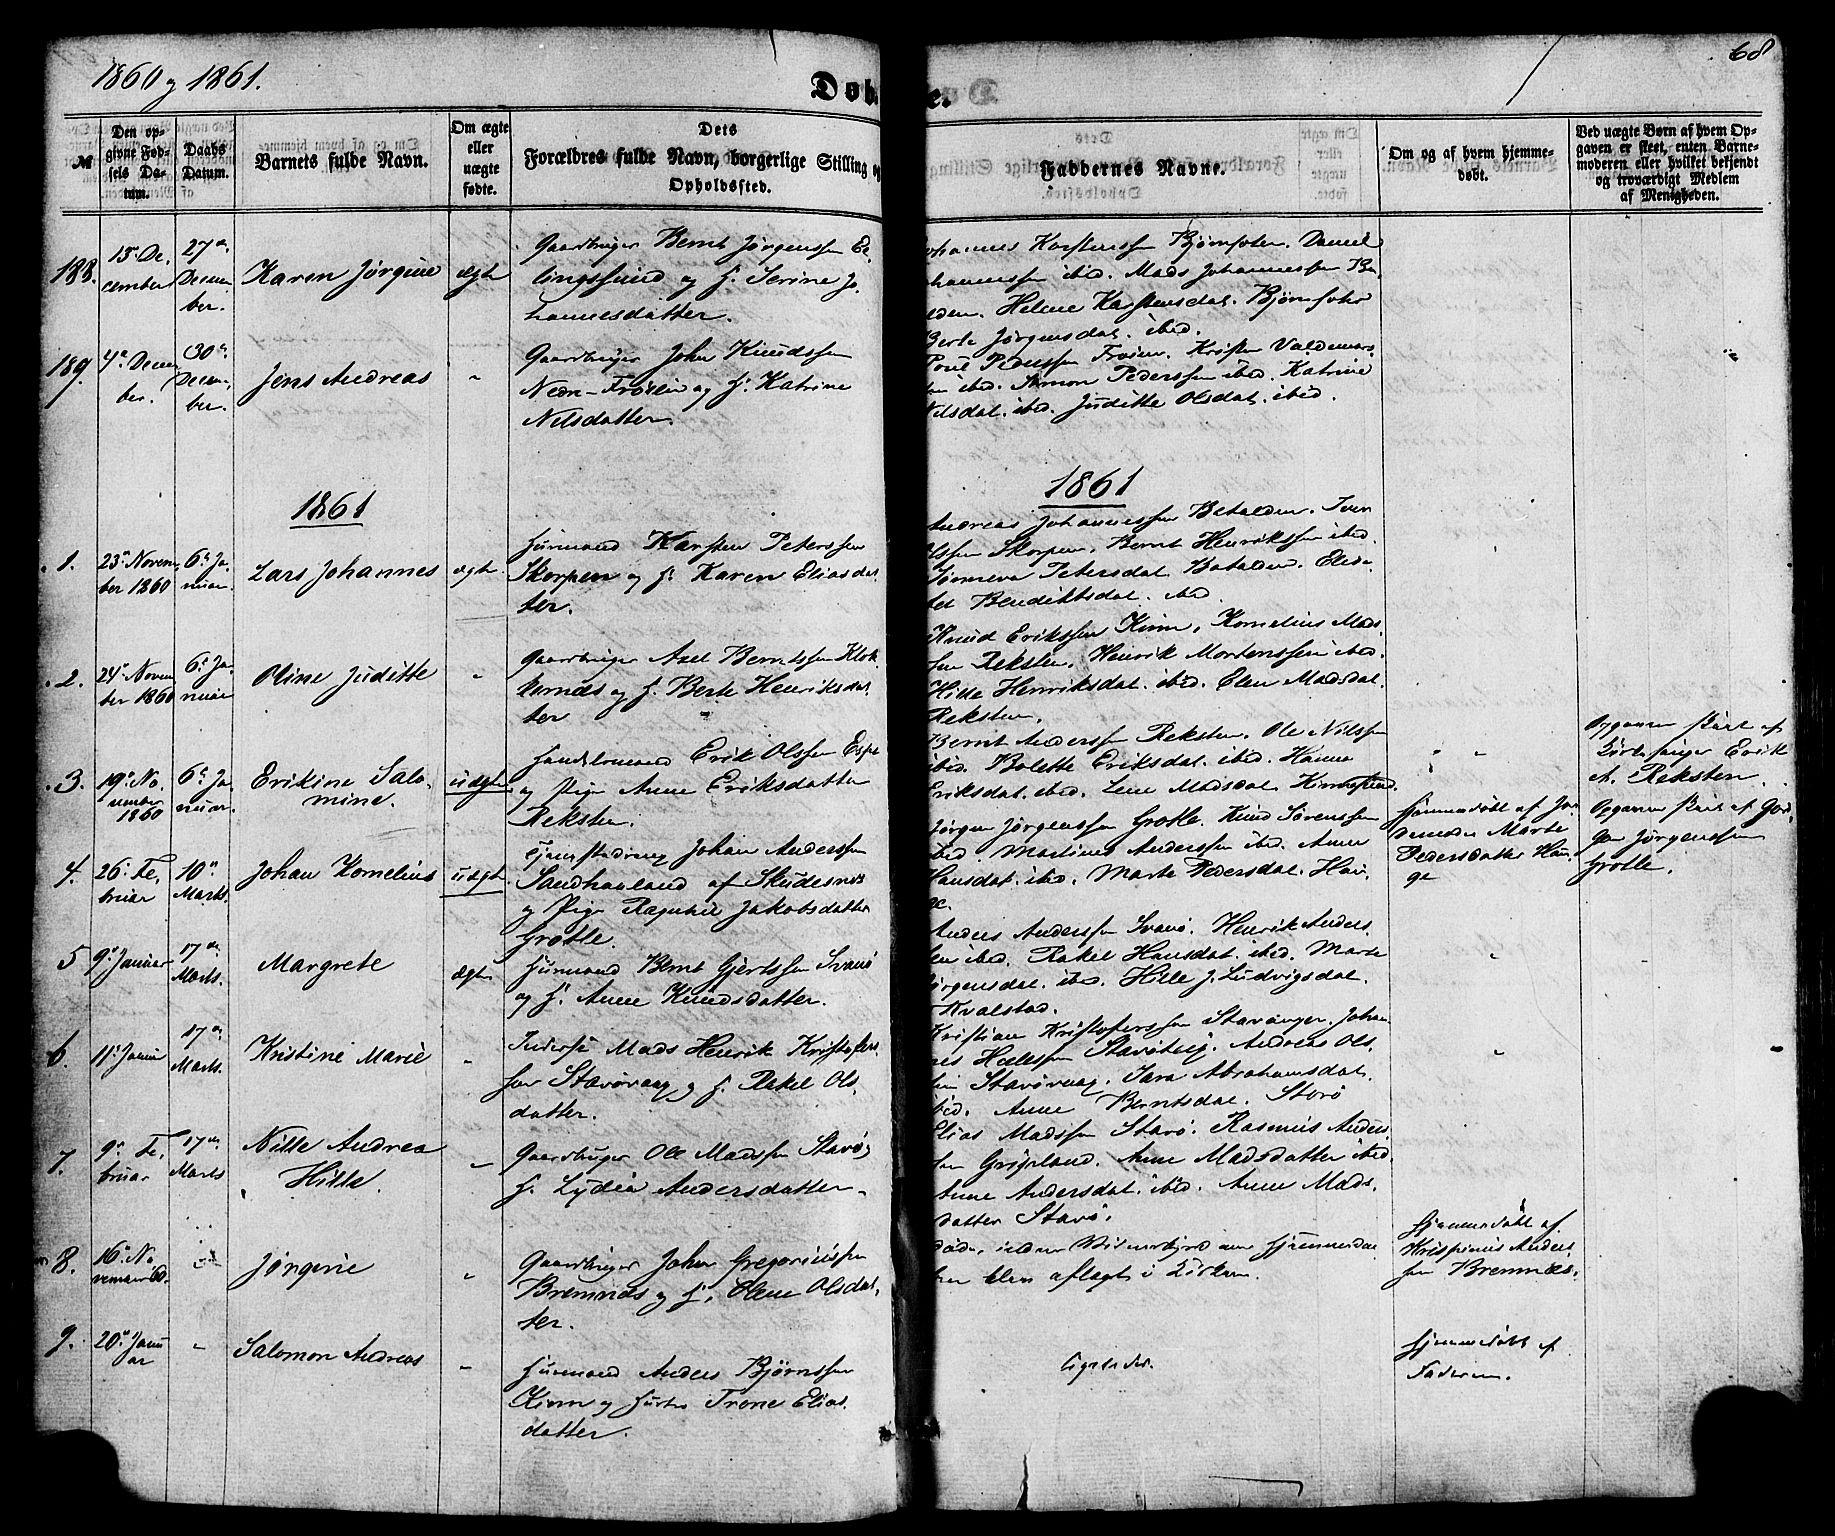 SAB, Kinn sokneprestembete, H/Haa/Haaa/L0006: Ministerialbok nr. A 6, 1857-1885, s. 68